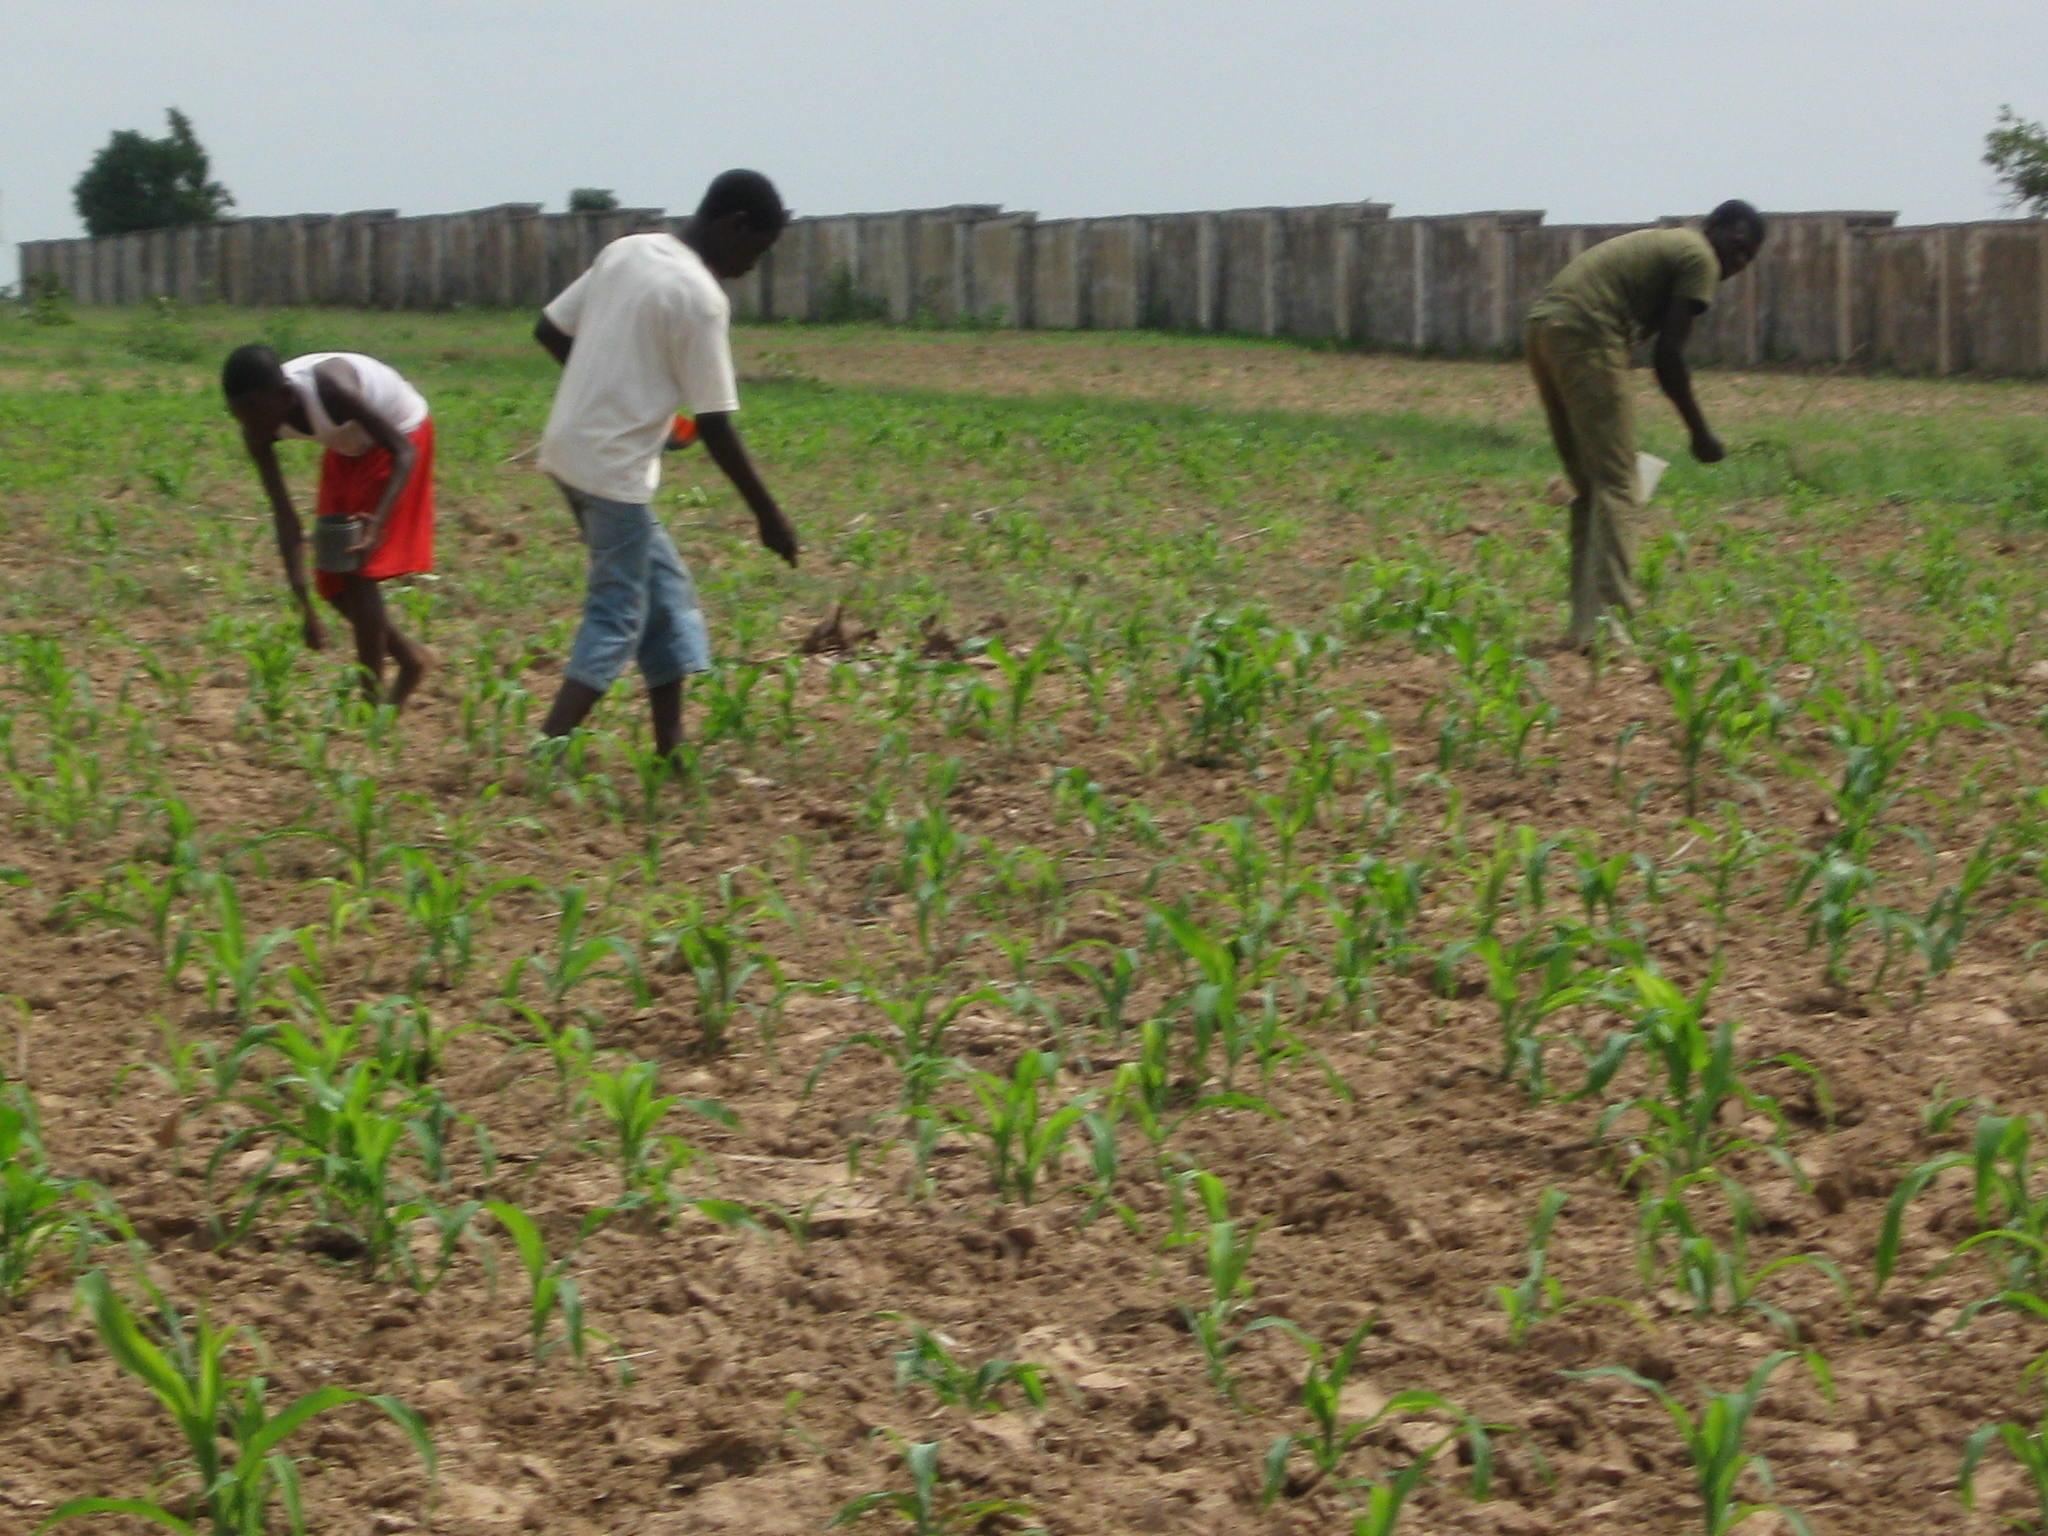 Call of Hope - Nigeria Farmer Evangelism